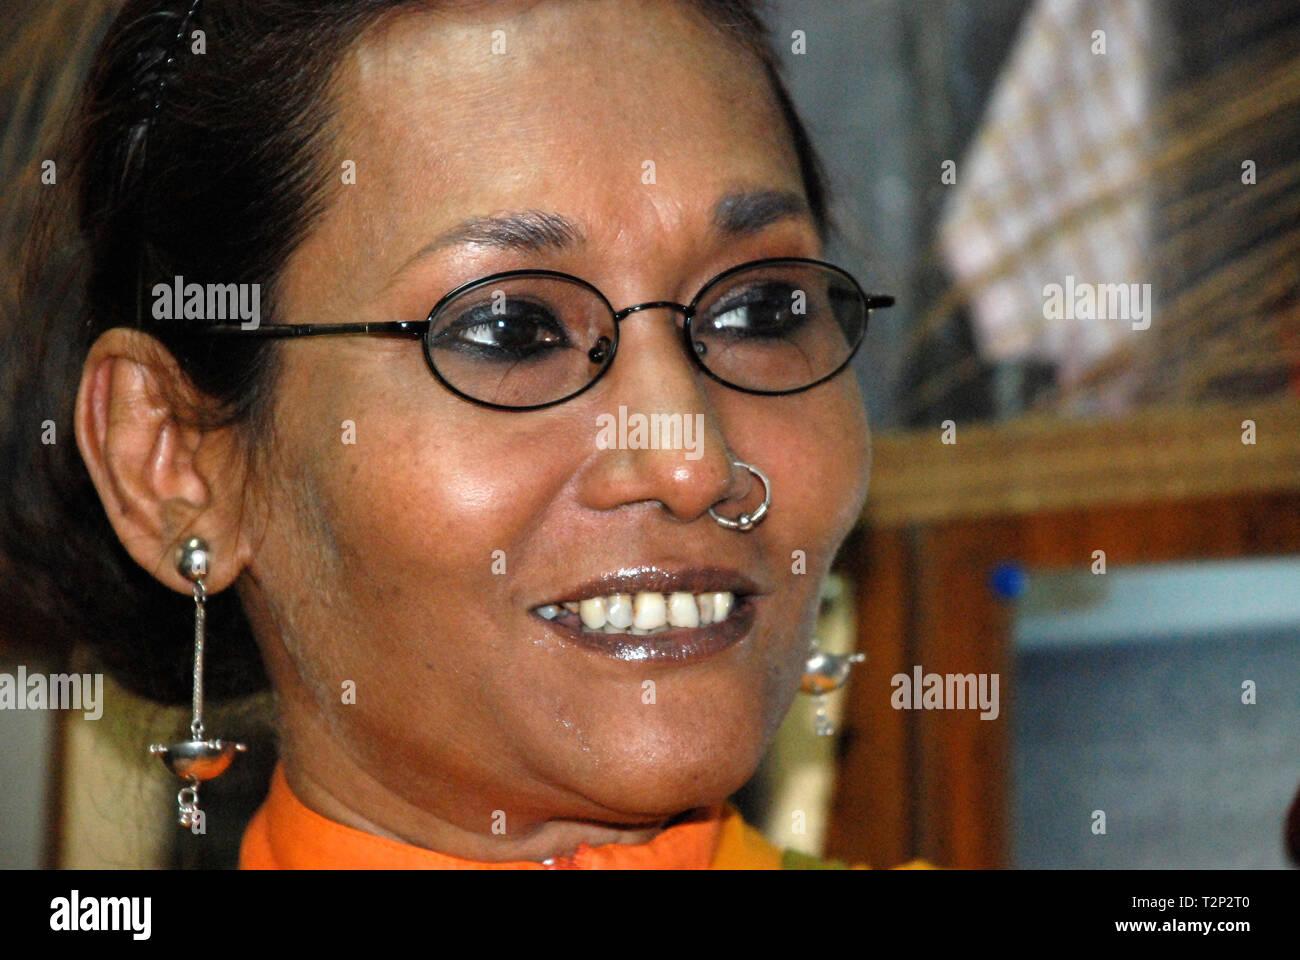 Bibi Russell Bangladeshi Fashion Designer Former International Model Stock Photo Alamy